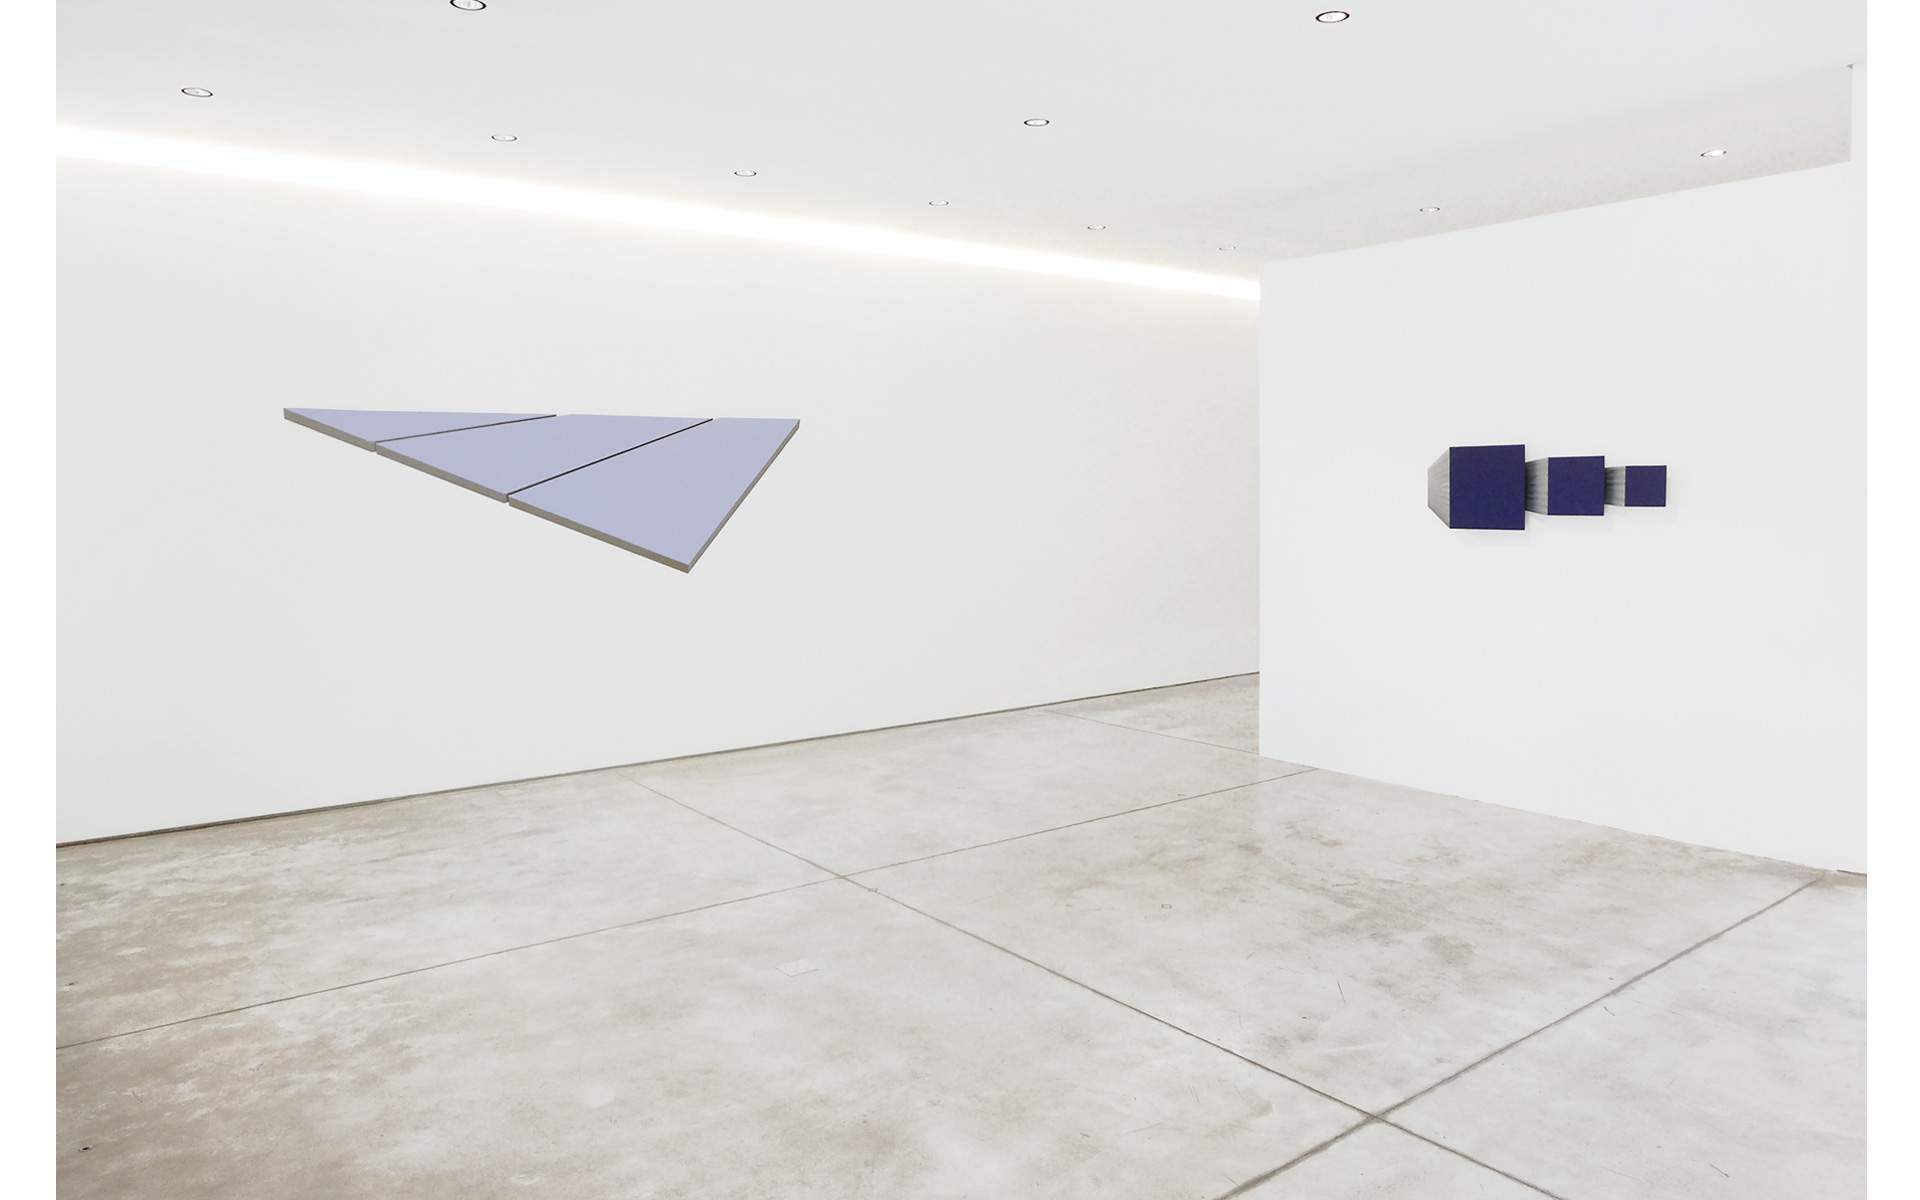 Installation view Gallery Raquel Arnaud, São Paulo, 2013